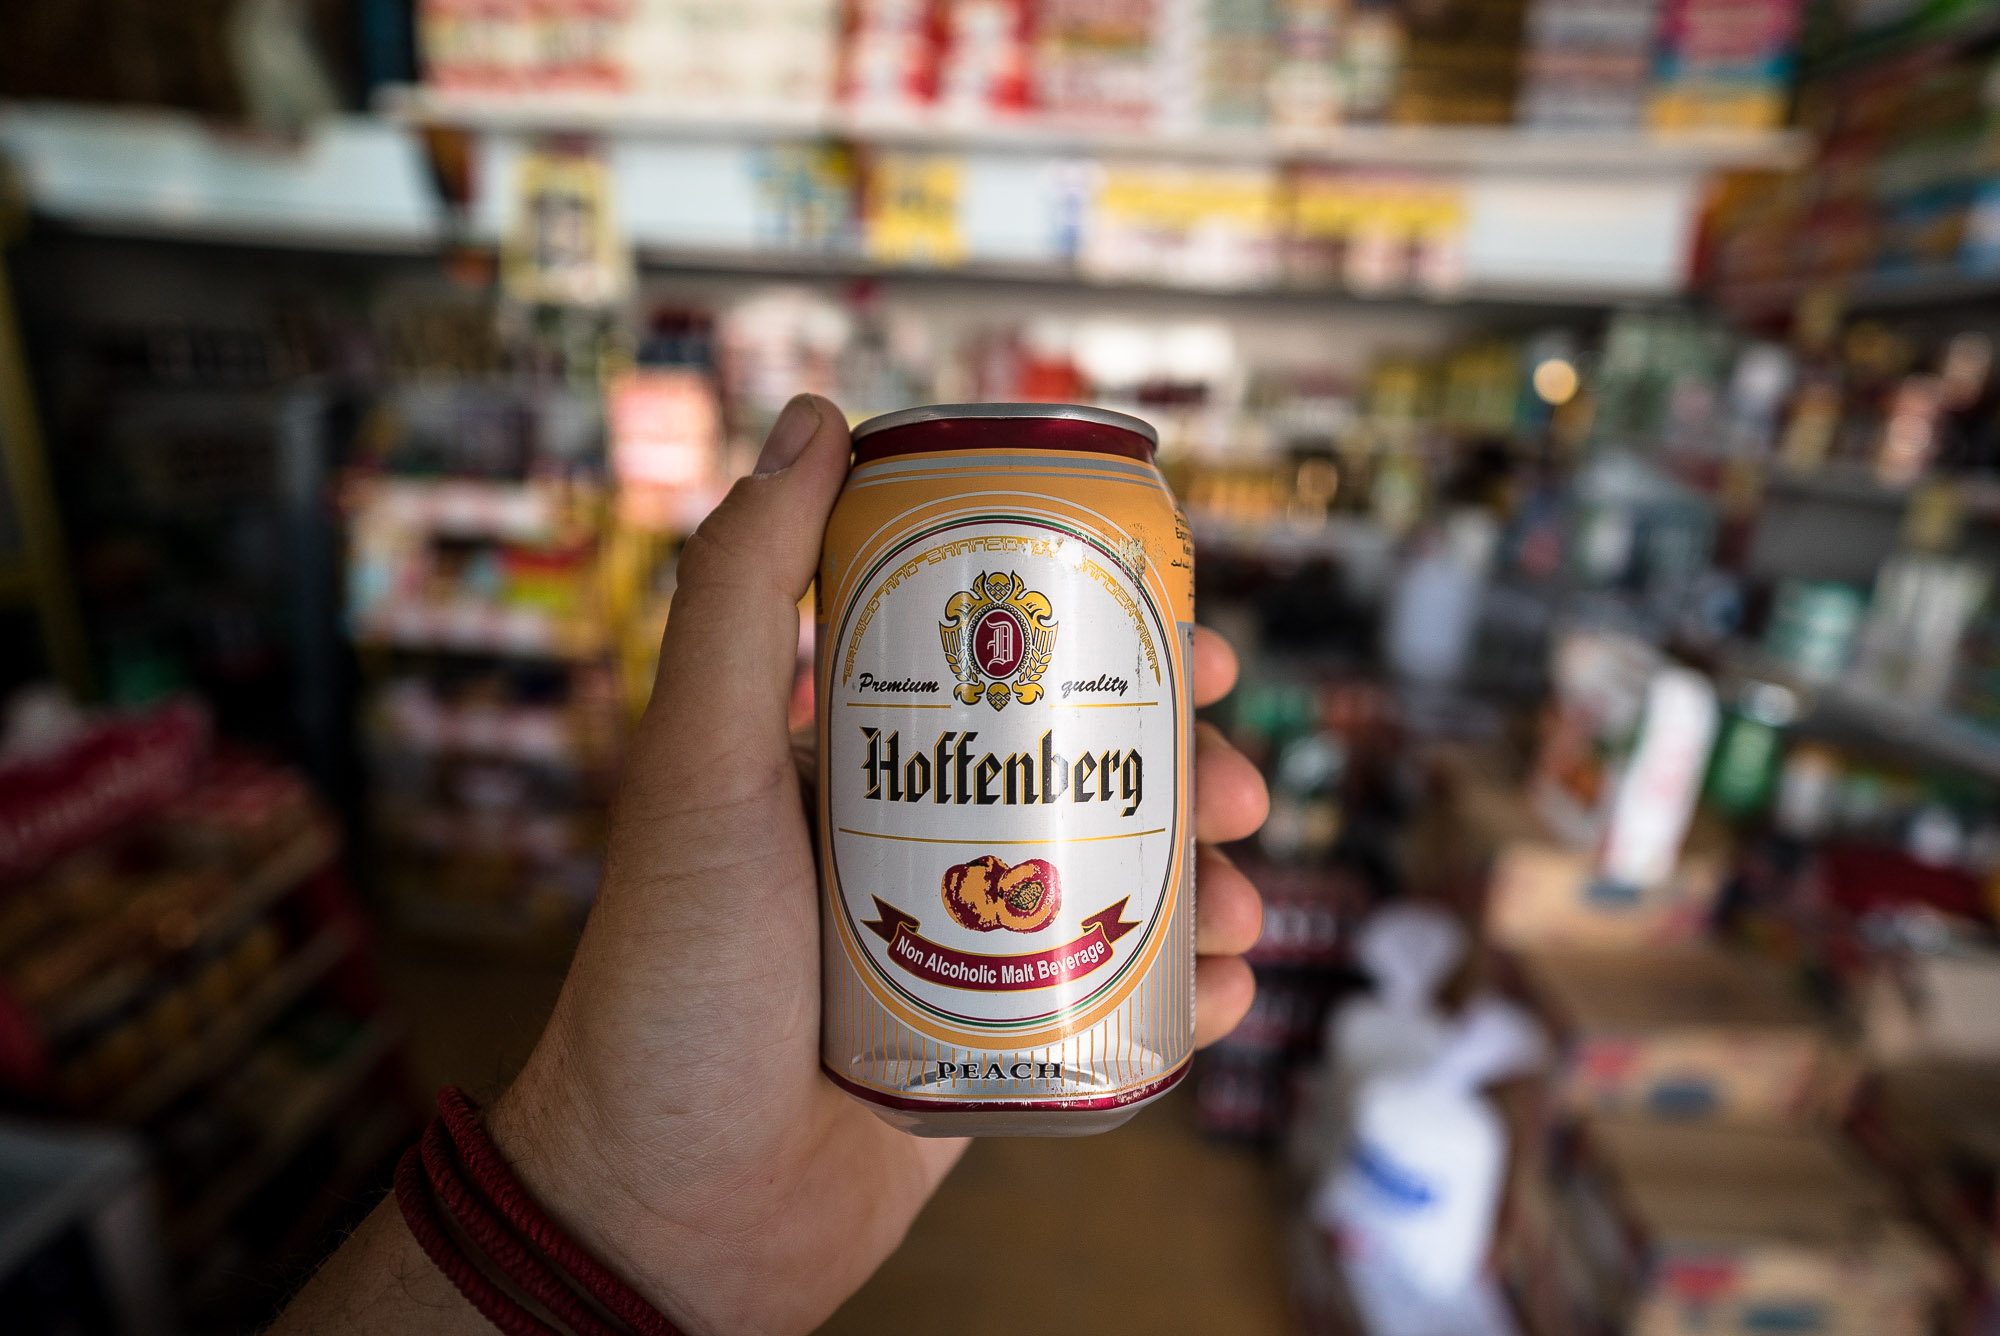 non alcoholic malt beverage